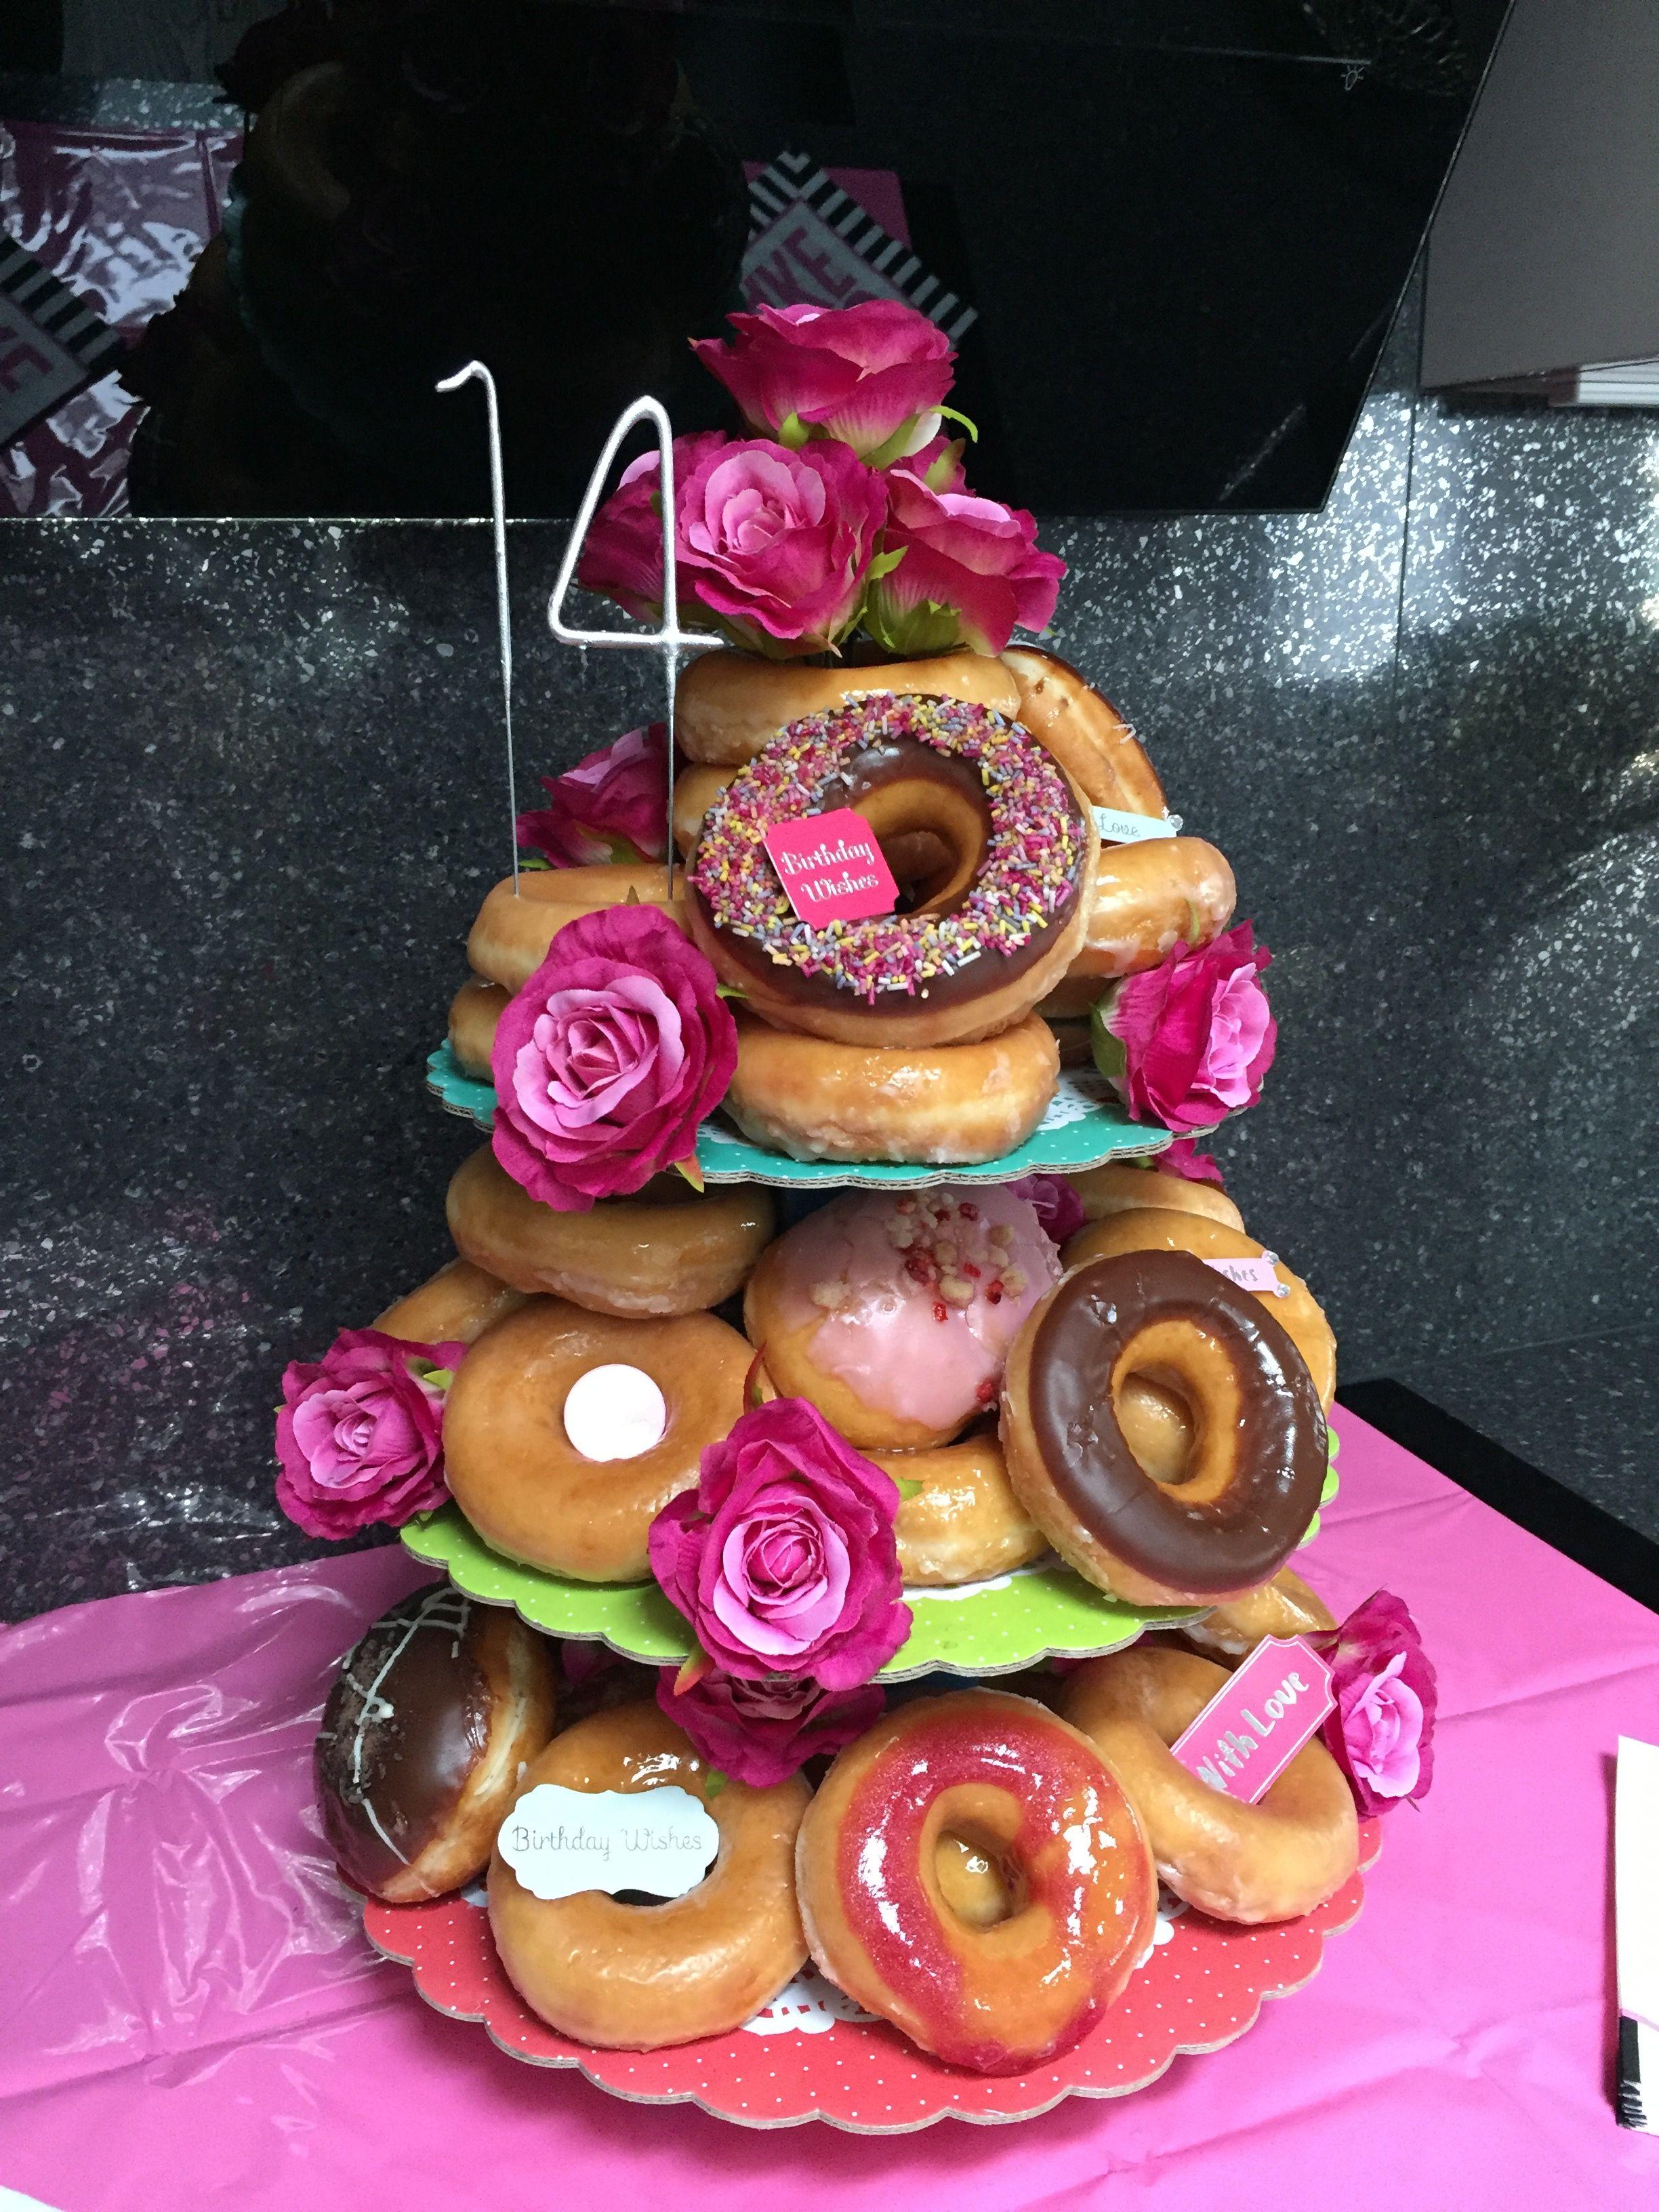 Strange Krispy Kreme Birthday Cake With Images Birthday Donuts Krispy Funny Birthday Cards Online Alyptdamsfinfo